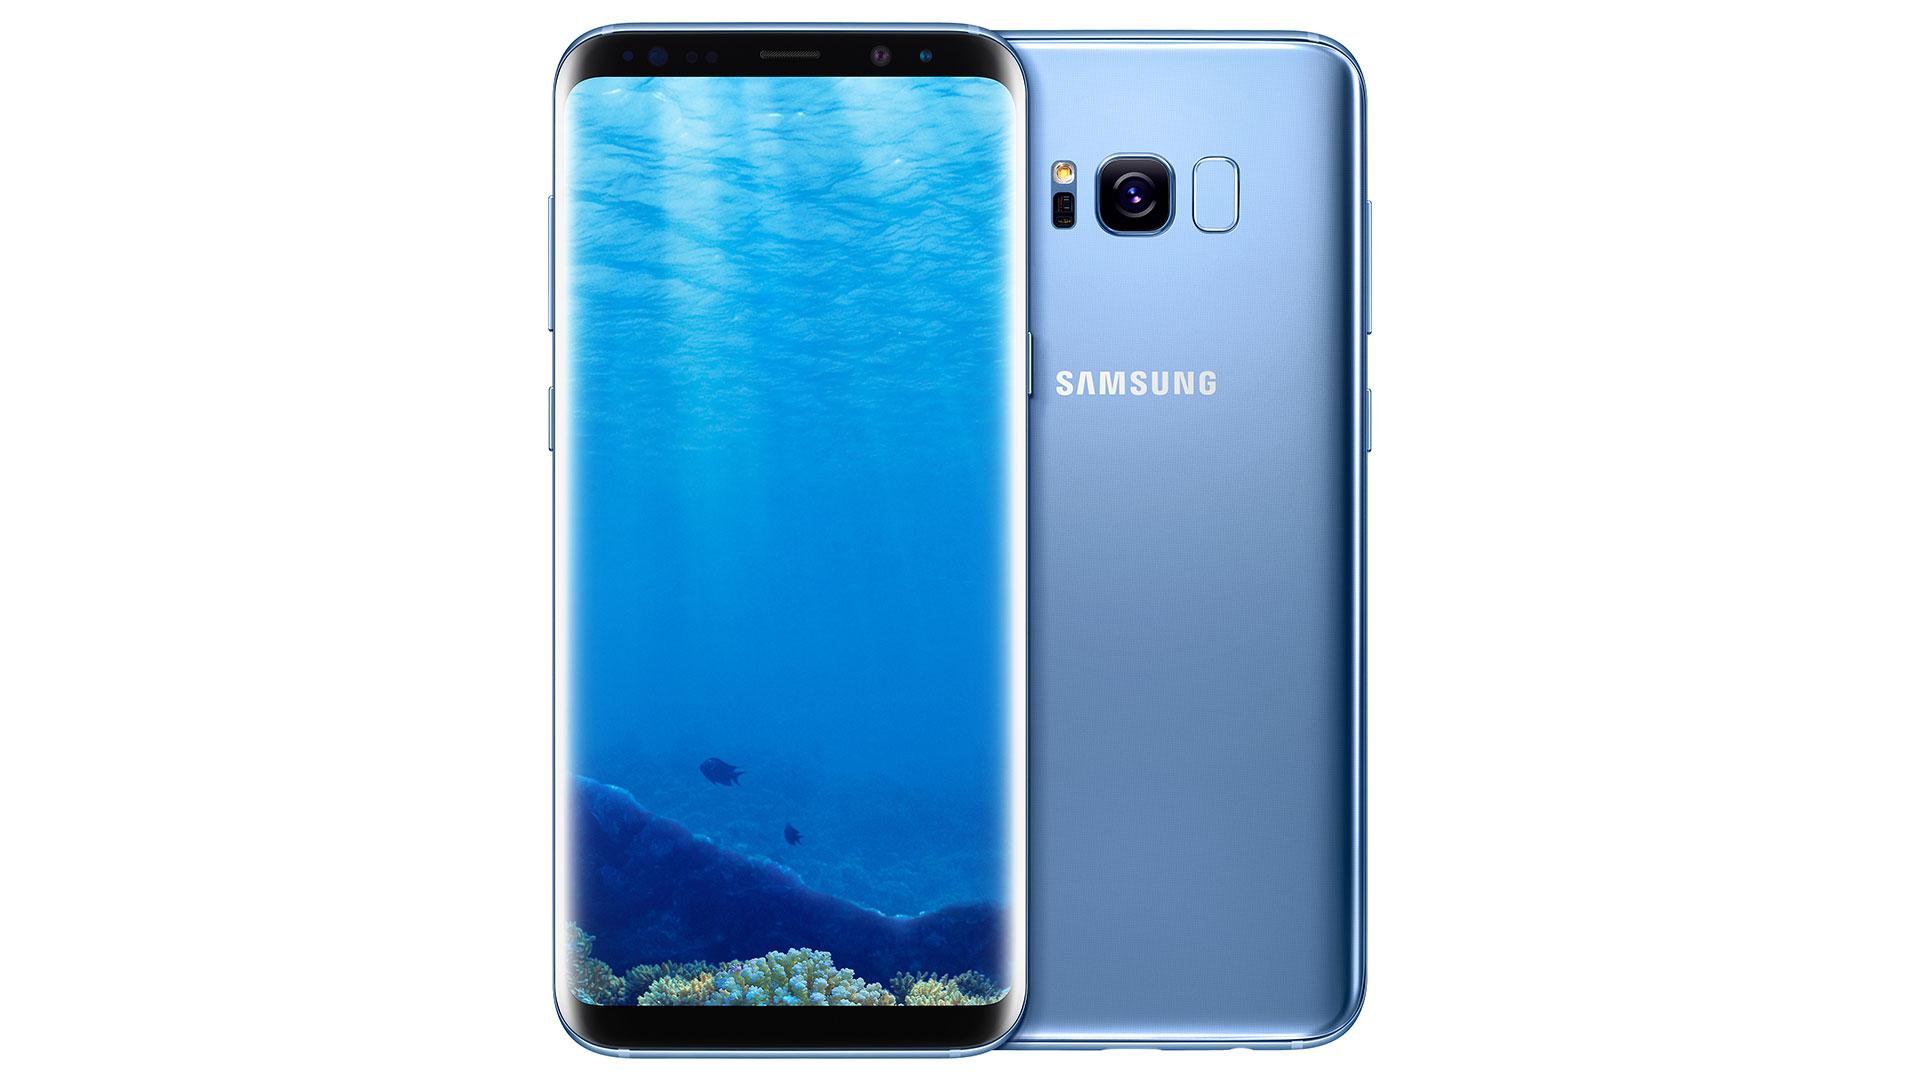 Samsung Galaxy S8 Coral Blue